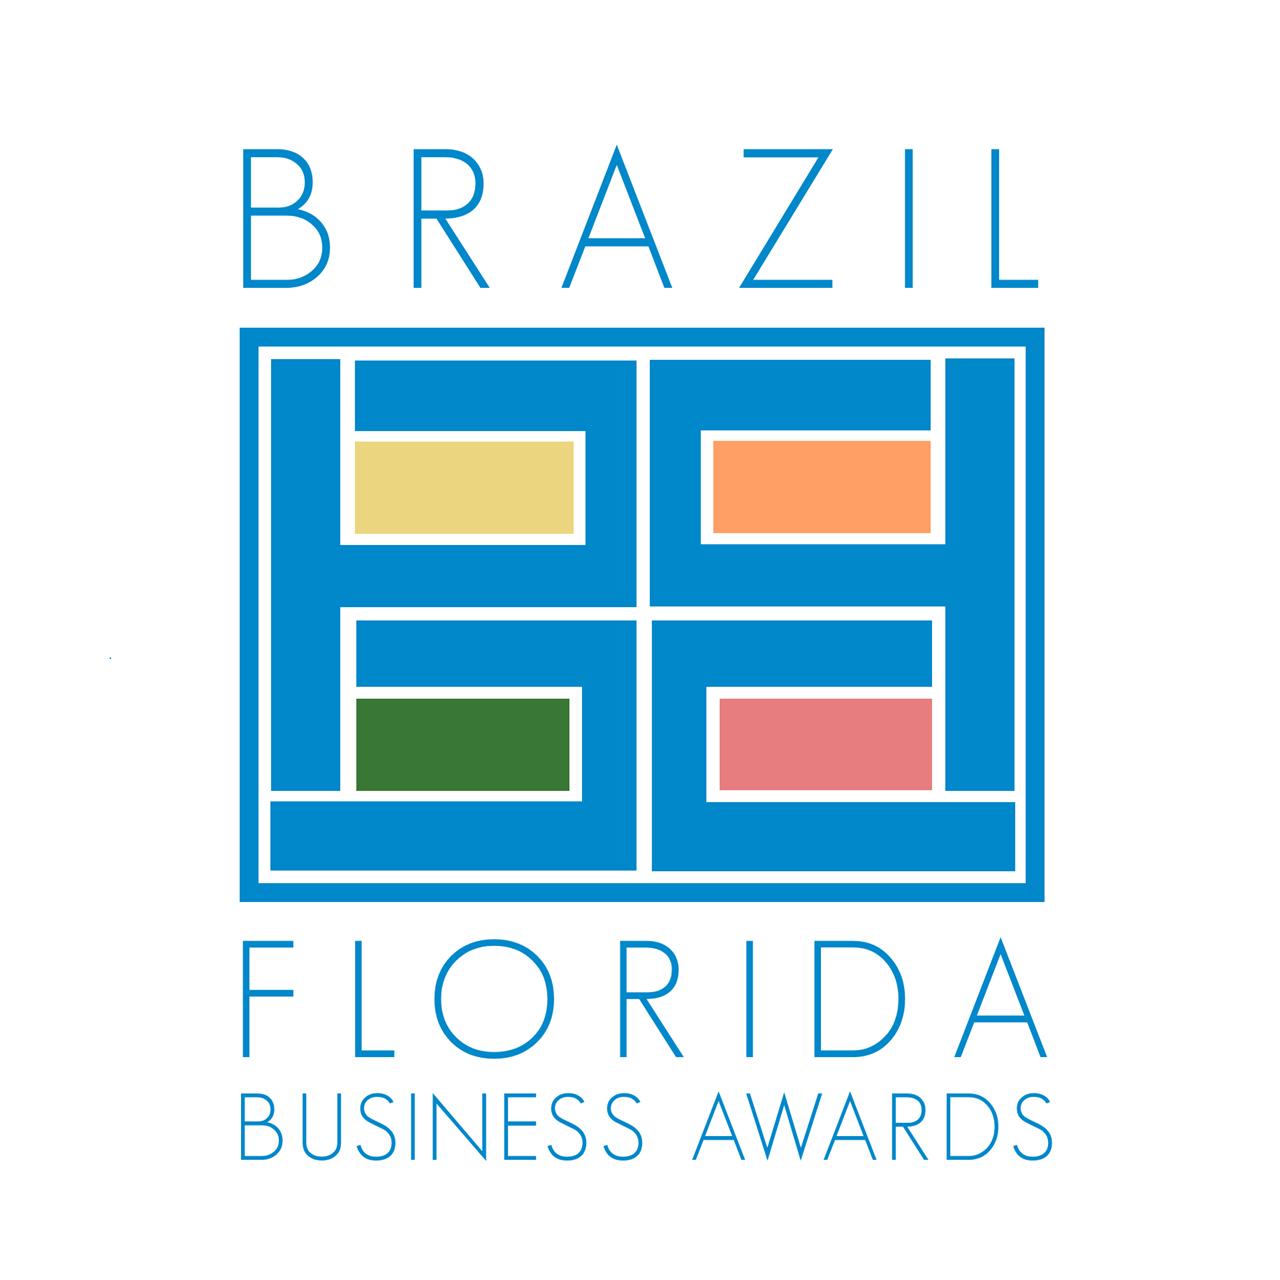 Brazil-Florida Business Council, Inc  - Events